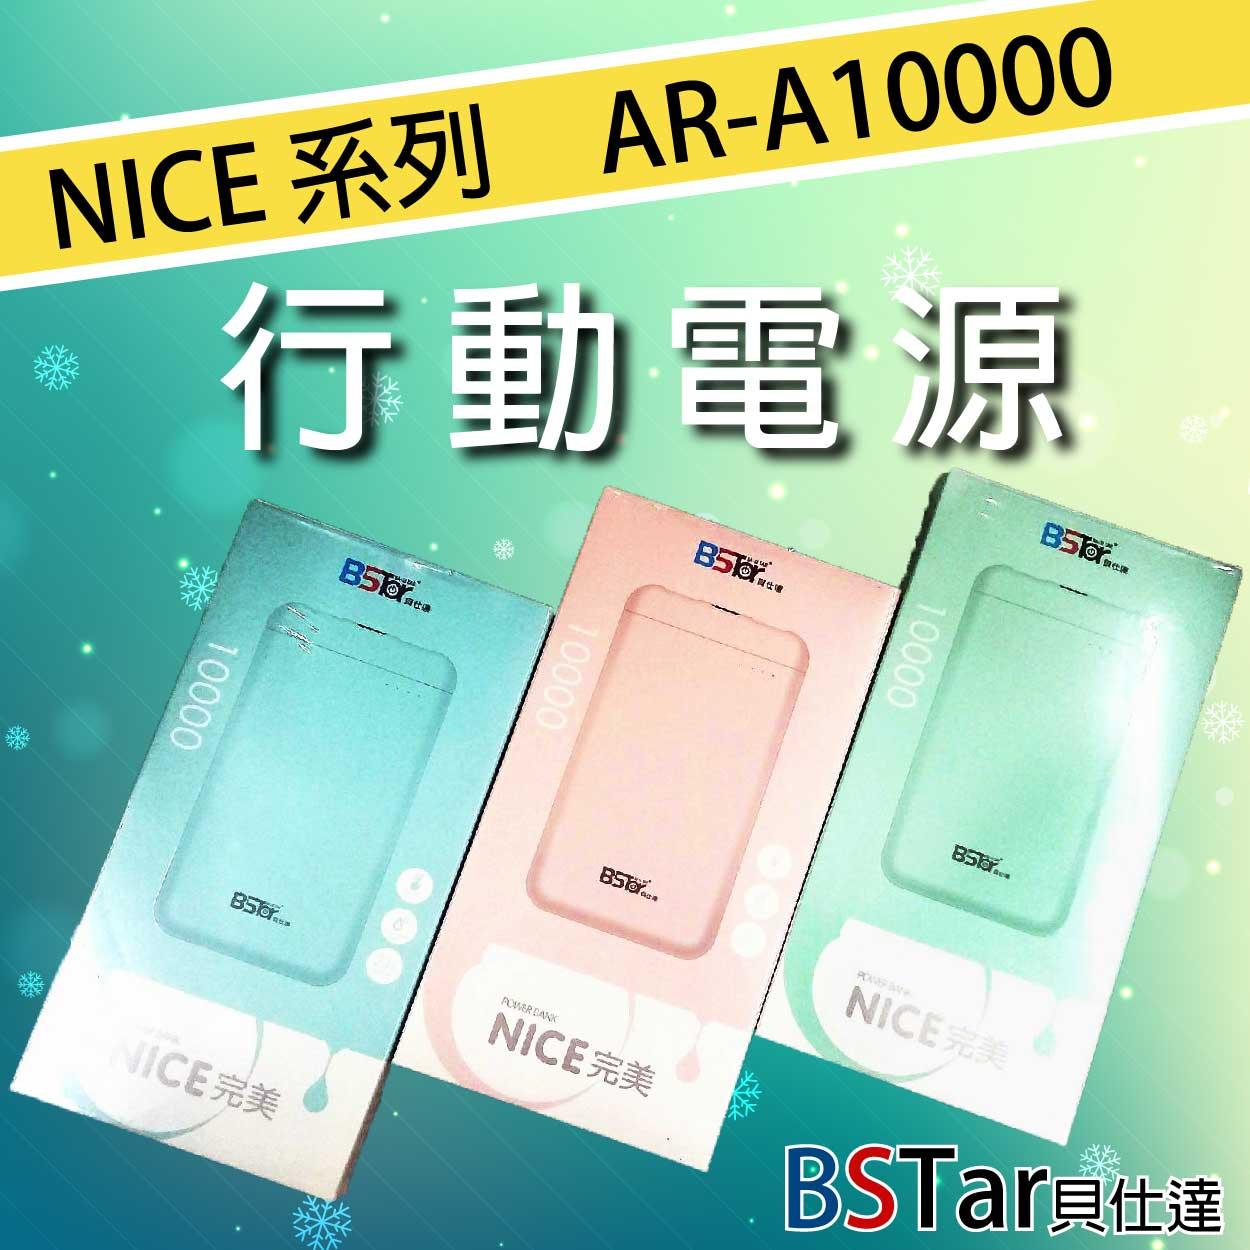 BSTar 貝仕達 NICE 系列 行動電源 AR-A10000 鋰聚合物電芯 移動/行動電源